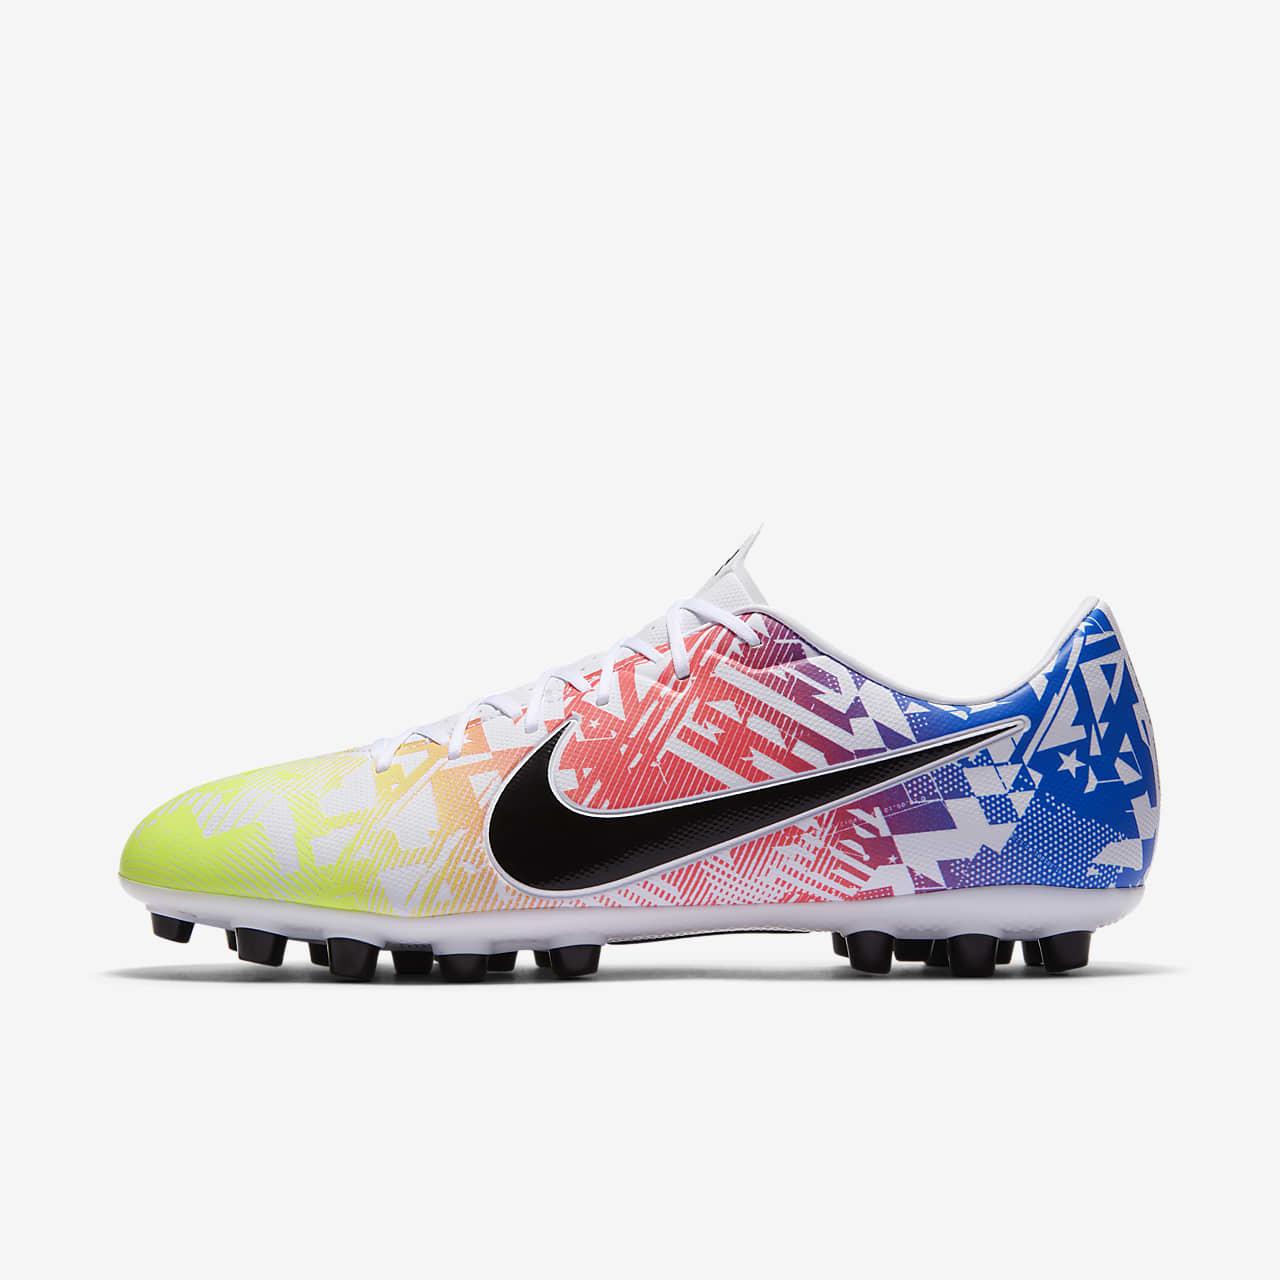 Chaussure de football à crampons pour terrain synthétique Nike Mercurial Vapor 13 Academy Neymar Jr. AG